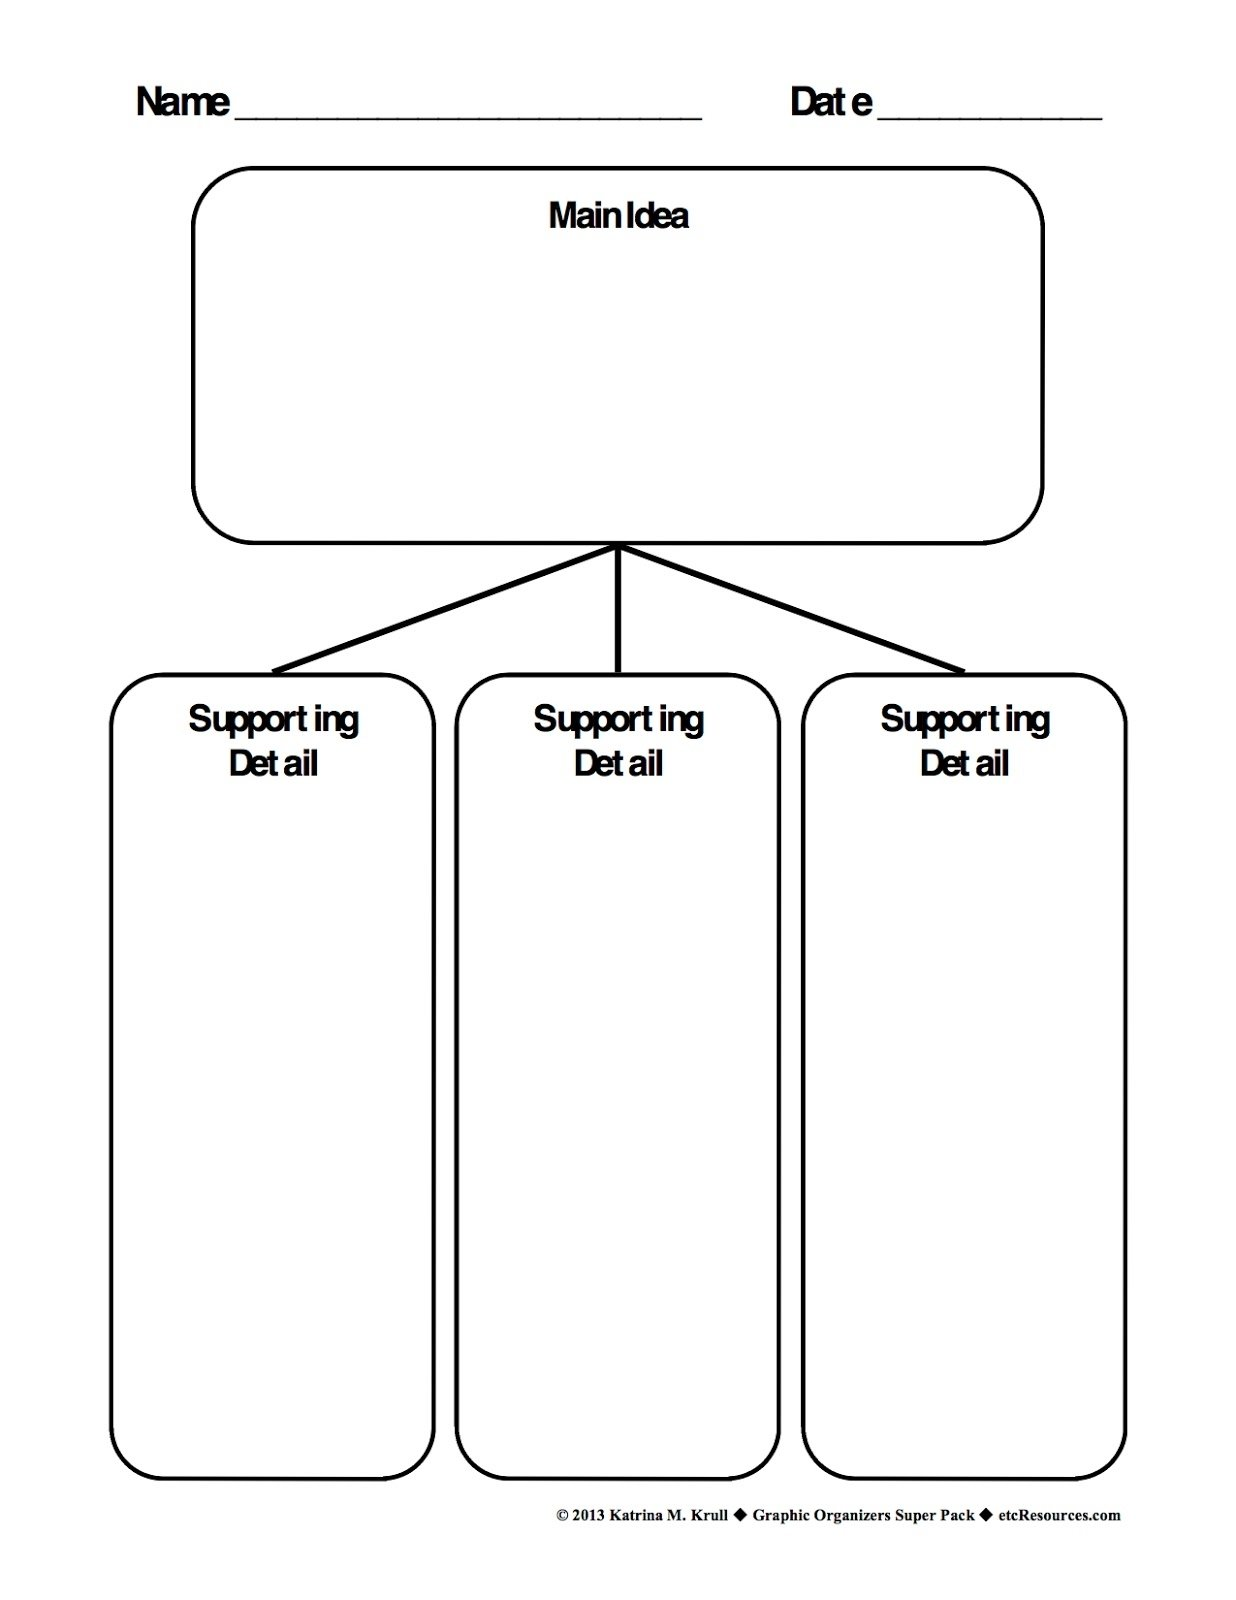 10 Spectacular Main Idea Detail Graphic Organizer ms bakamis 3rd grade class main ideas supportive details 3